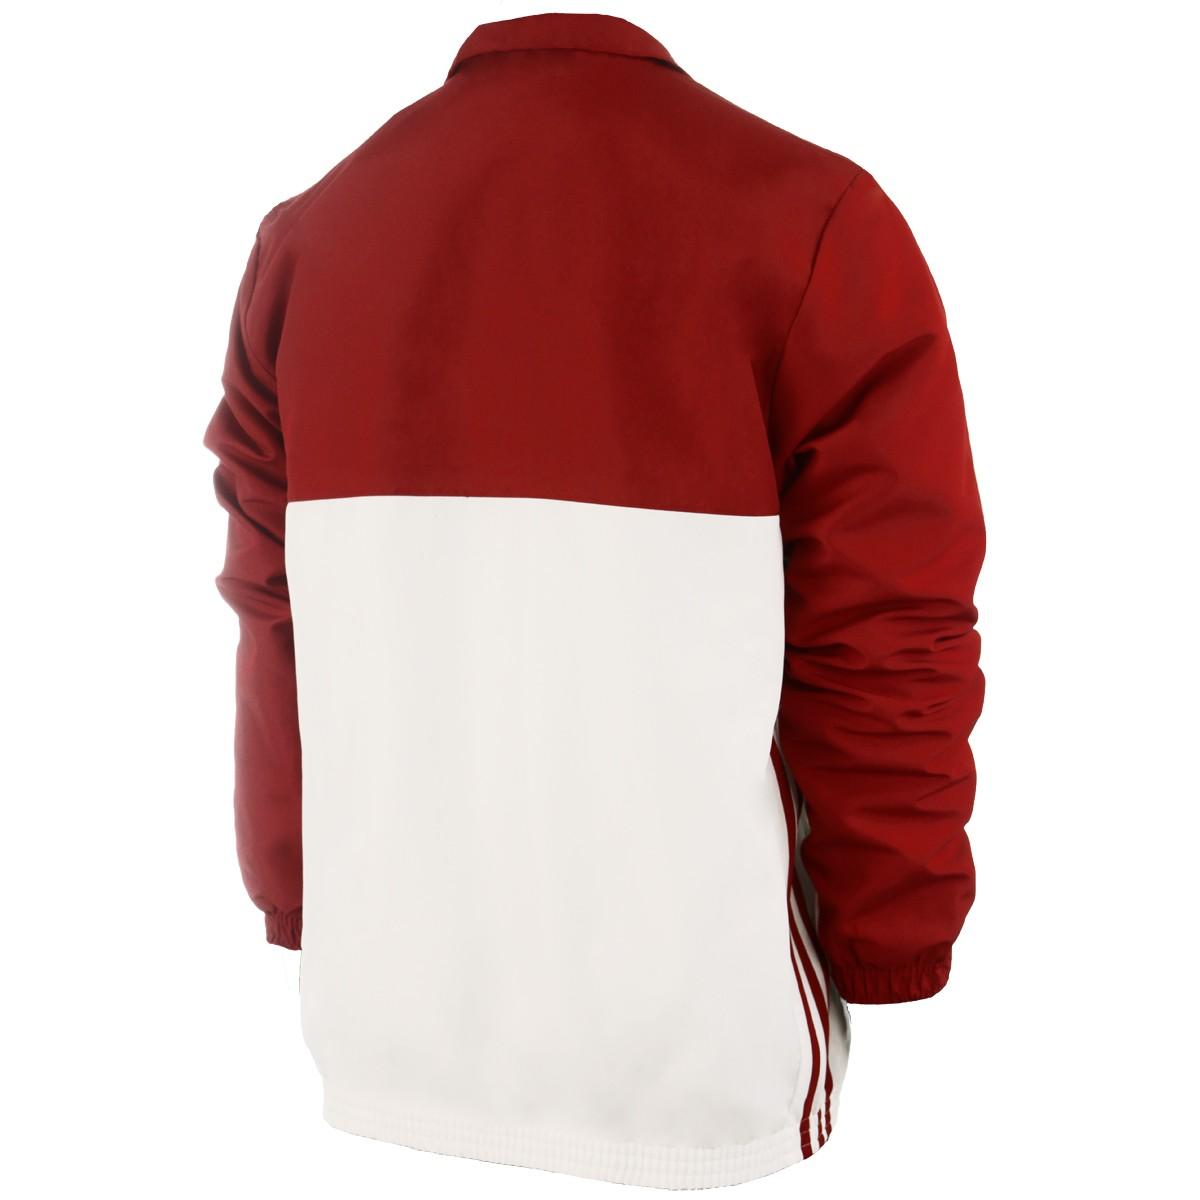 6564f4a83d66d Zippee Veste Team Adidas Adidas Tennispro Veste xY1gwBxqf